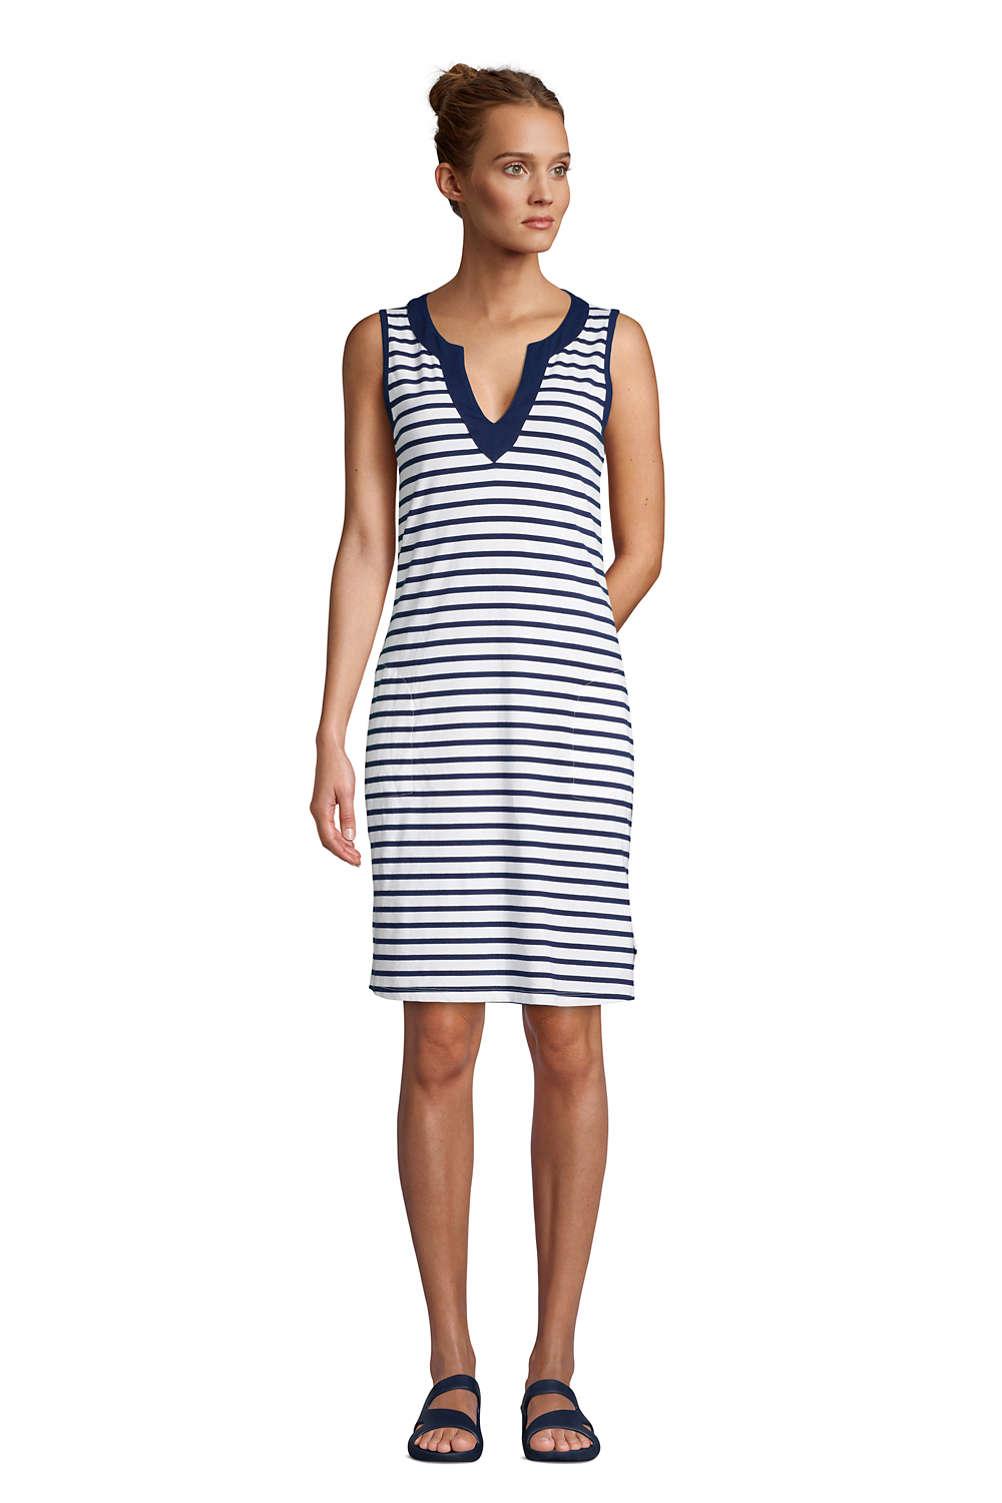 b73c042a05 Women's Cotton Jersey Sleeveless Swim Cover-up Dress Print from Lands' End